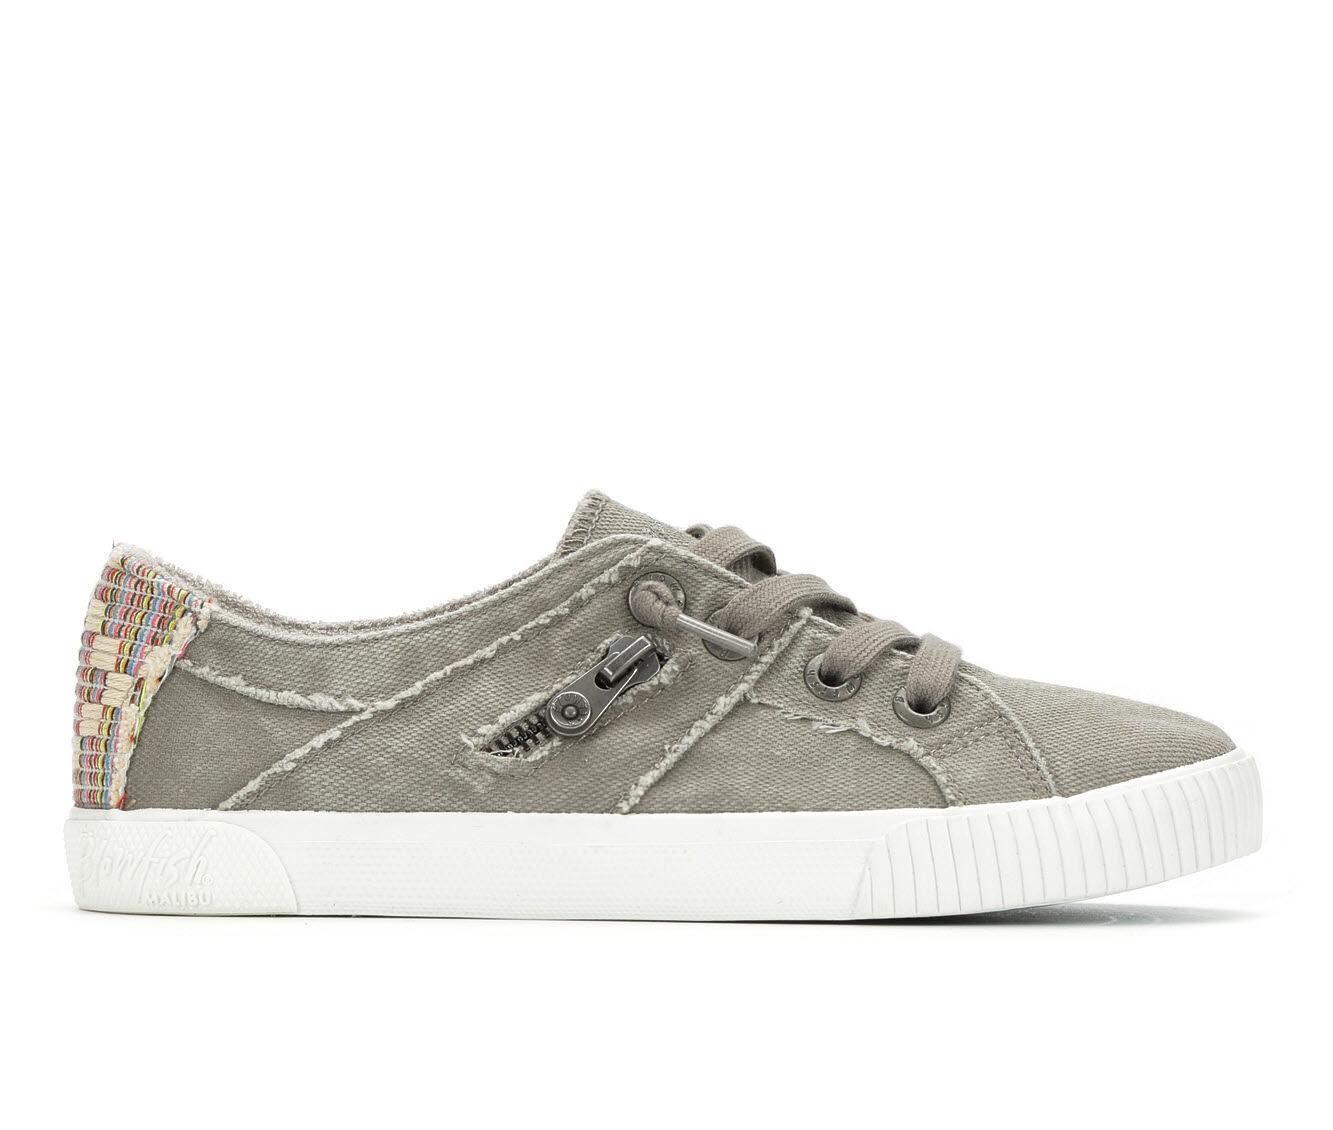 uk shoes_kd4557